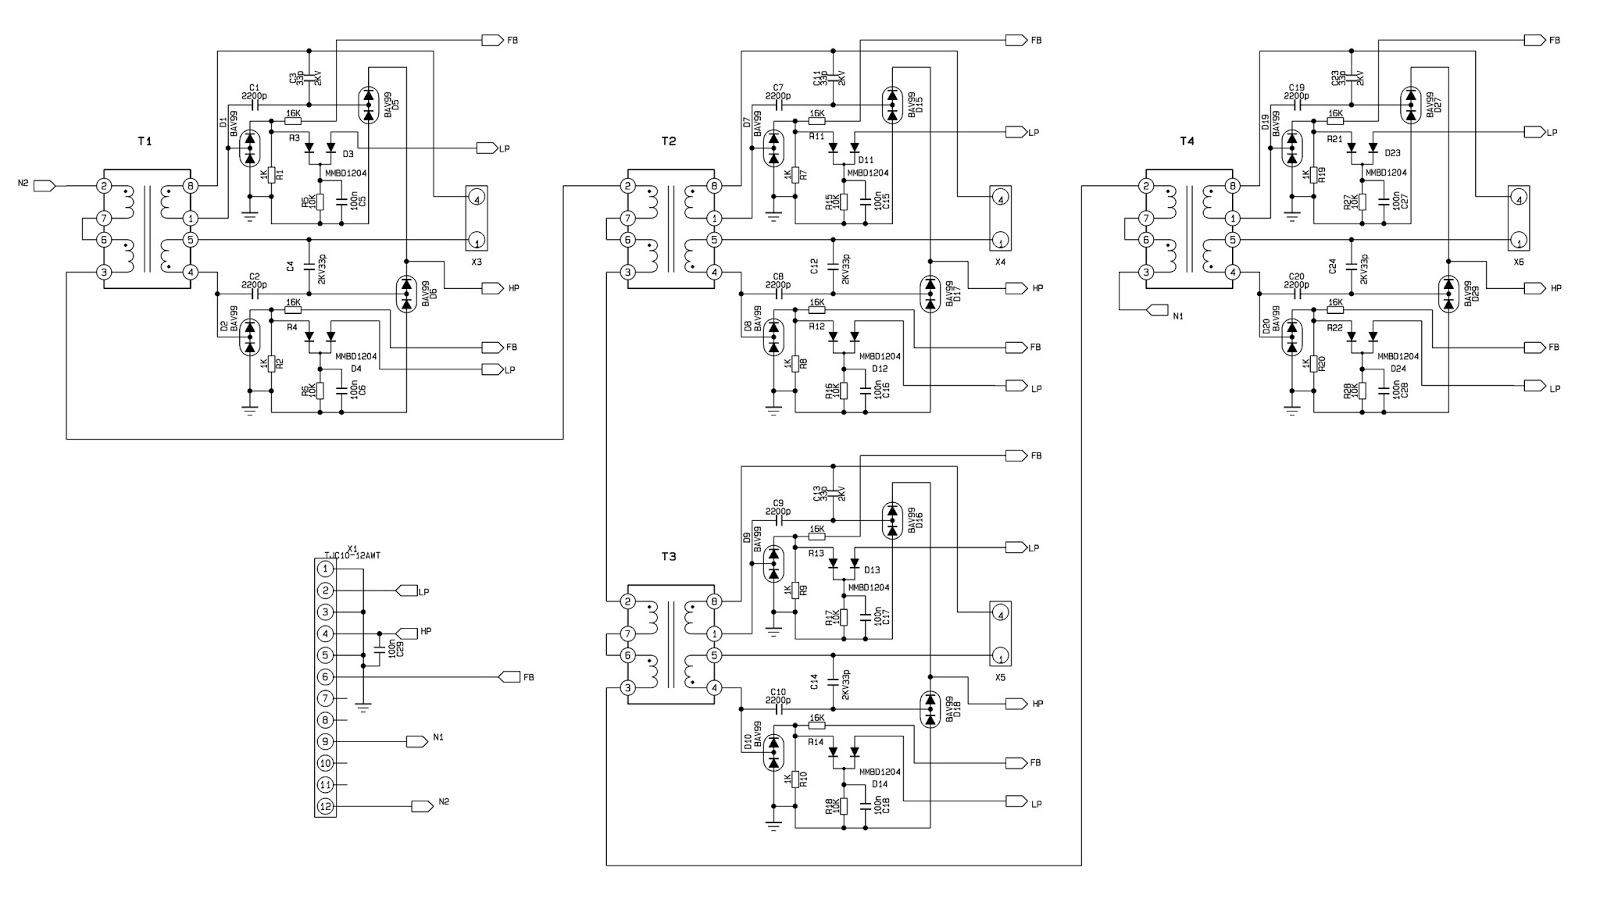 wiring harness 4l60e transmission shift solenoid diagram 4l60e